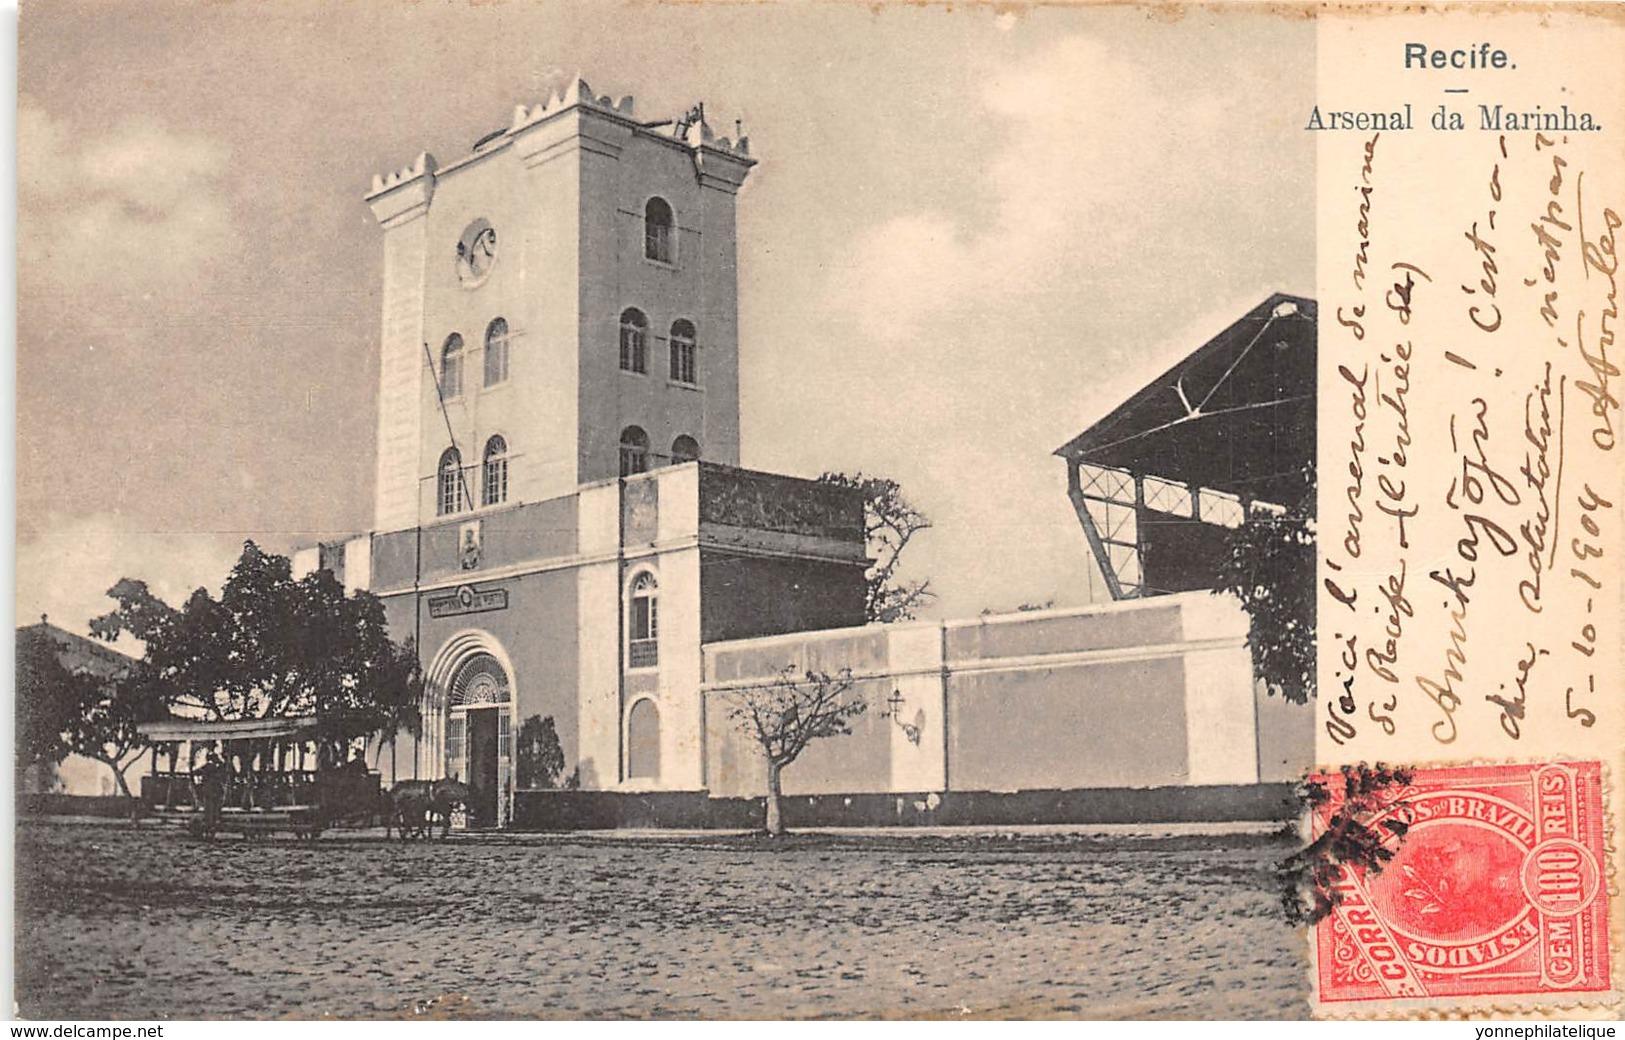 Brésil / Recife - 102 - Arsenal Da Marinha - Belle Oblitération - Recife